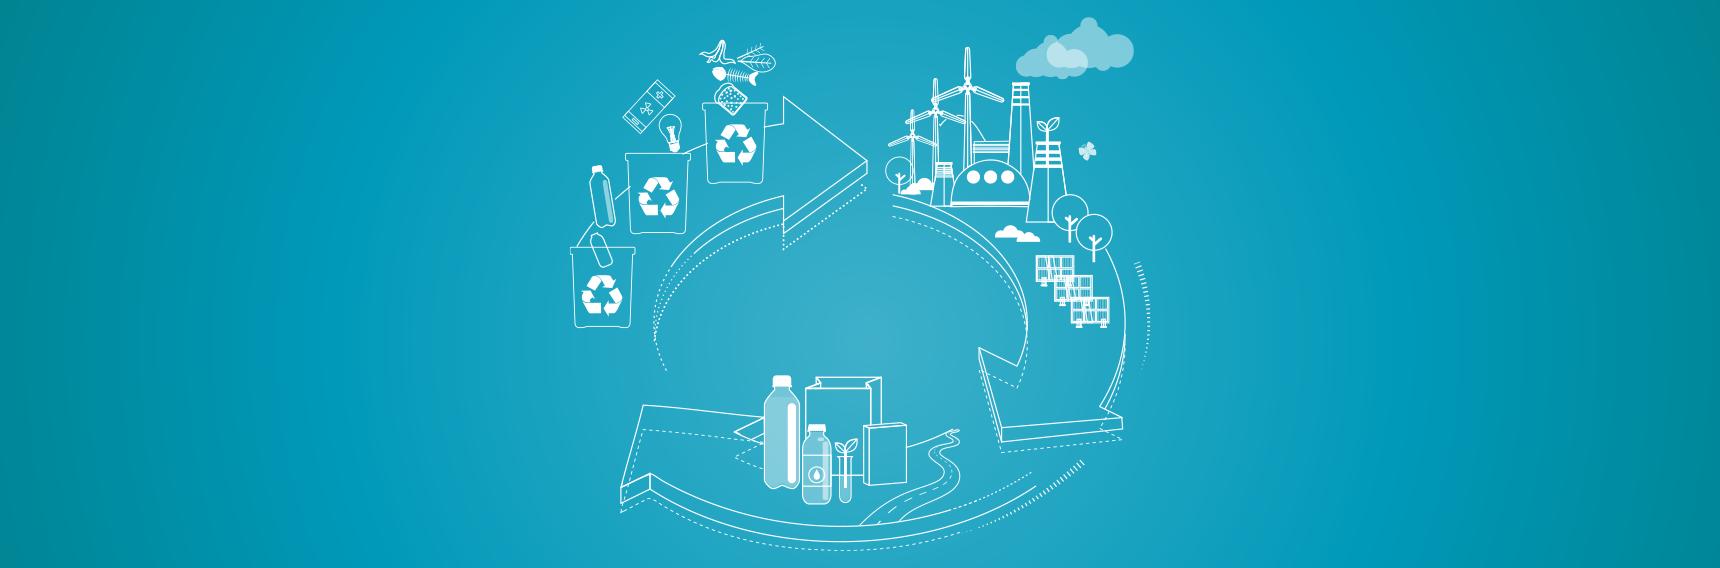 zrownowazone opakowania, sustainable packaging, ecology, ekologia